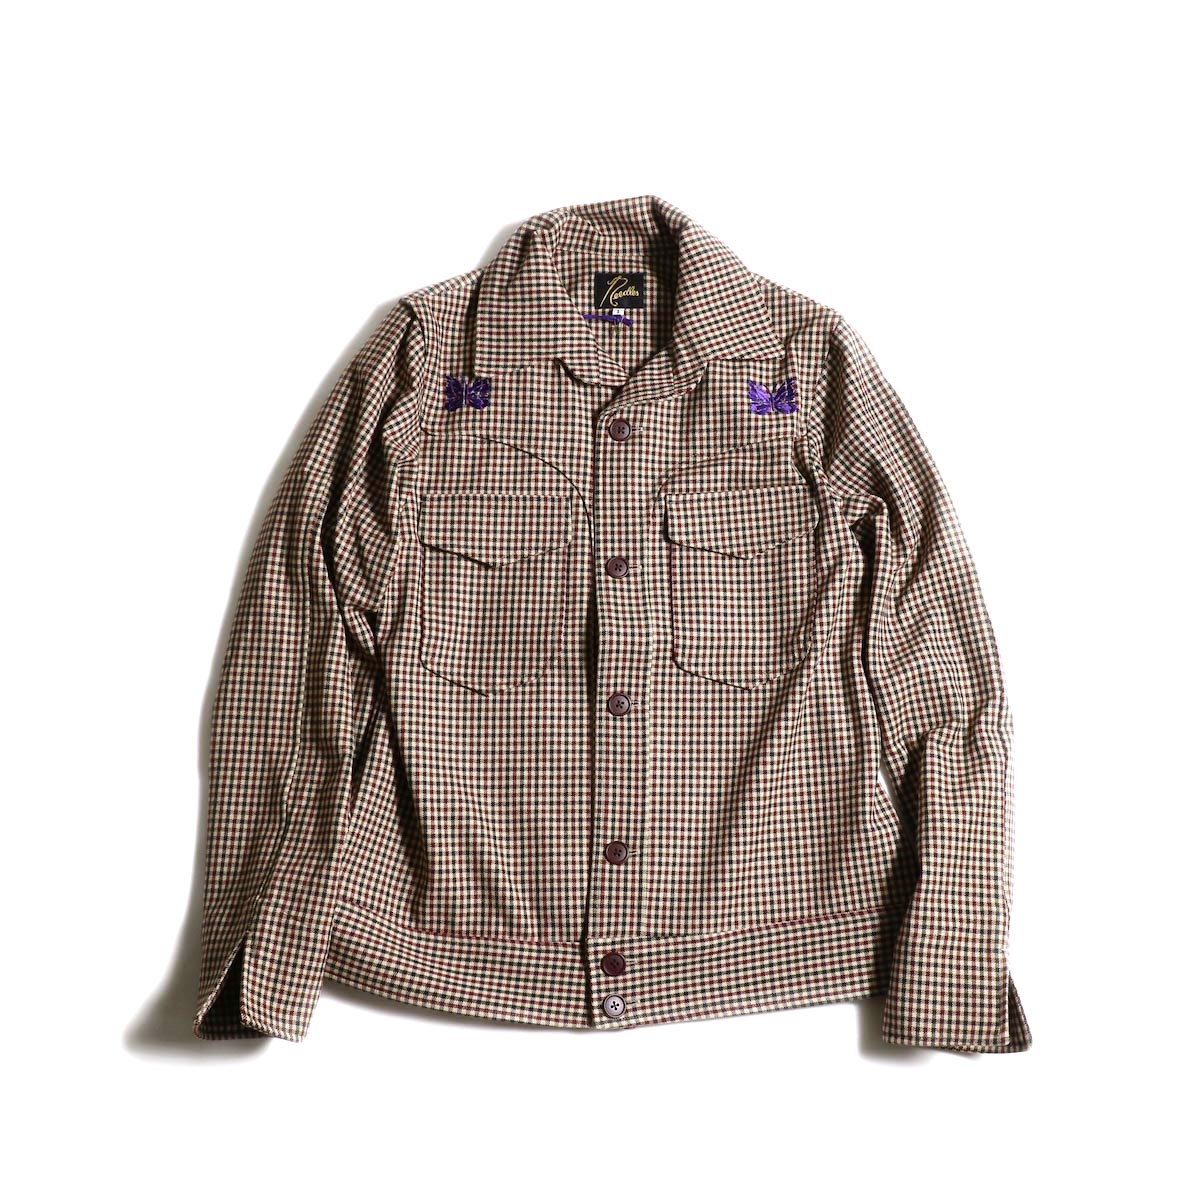 Needles / Cowboy Leisure Jacket -Gunclub Plaid (Bordeaux)正面